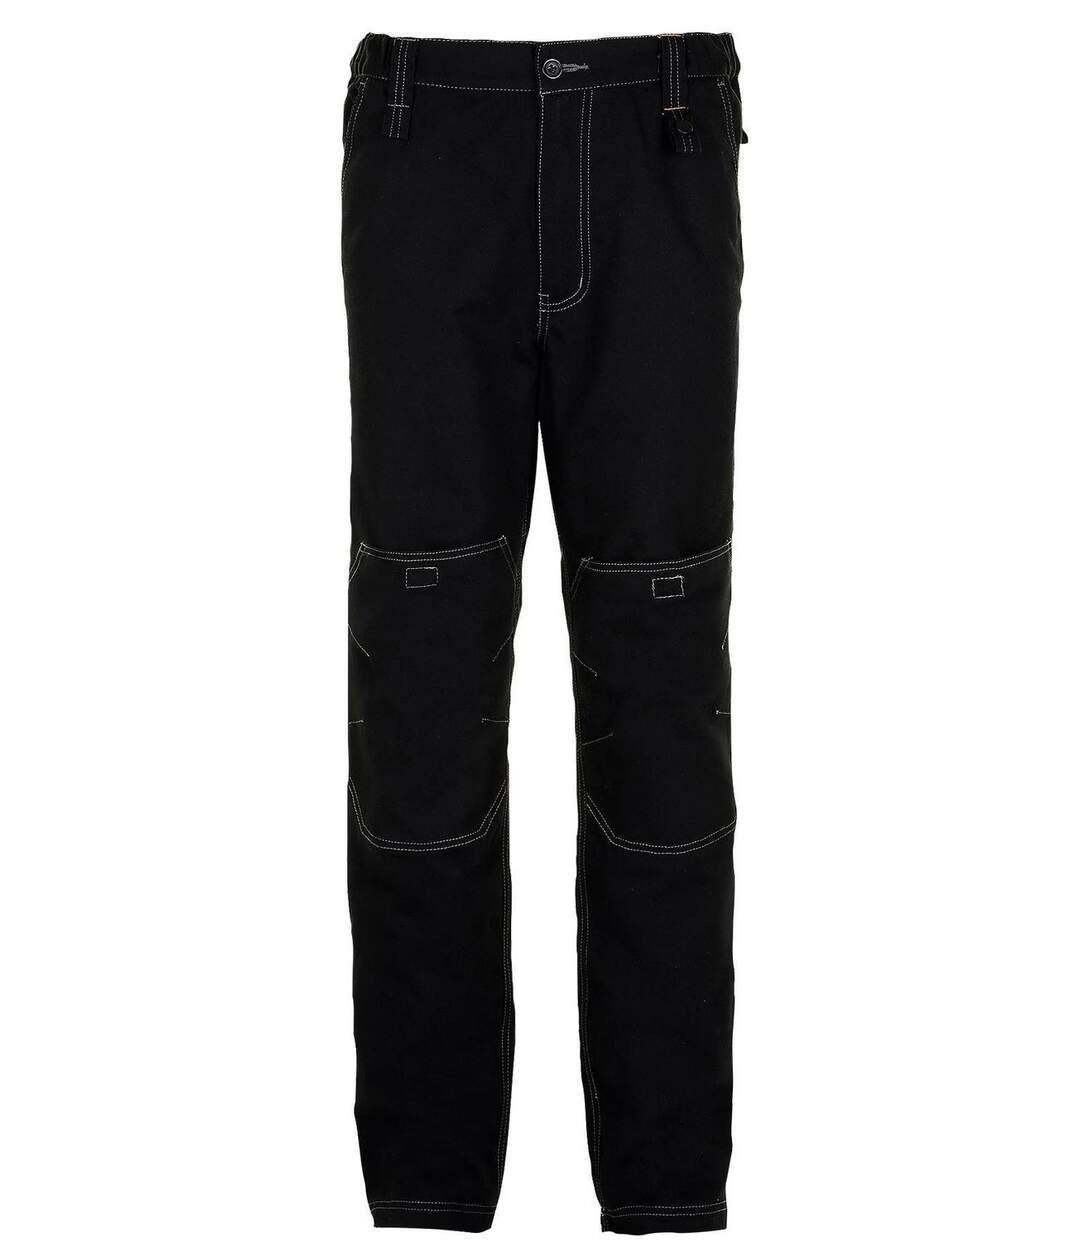 Pantalon de travail - workwear - PRO 01561 - noir